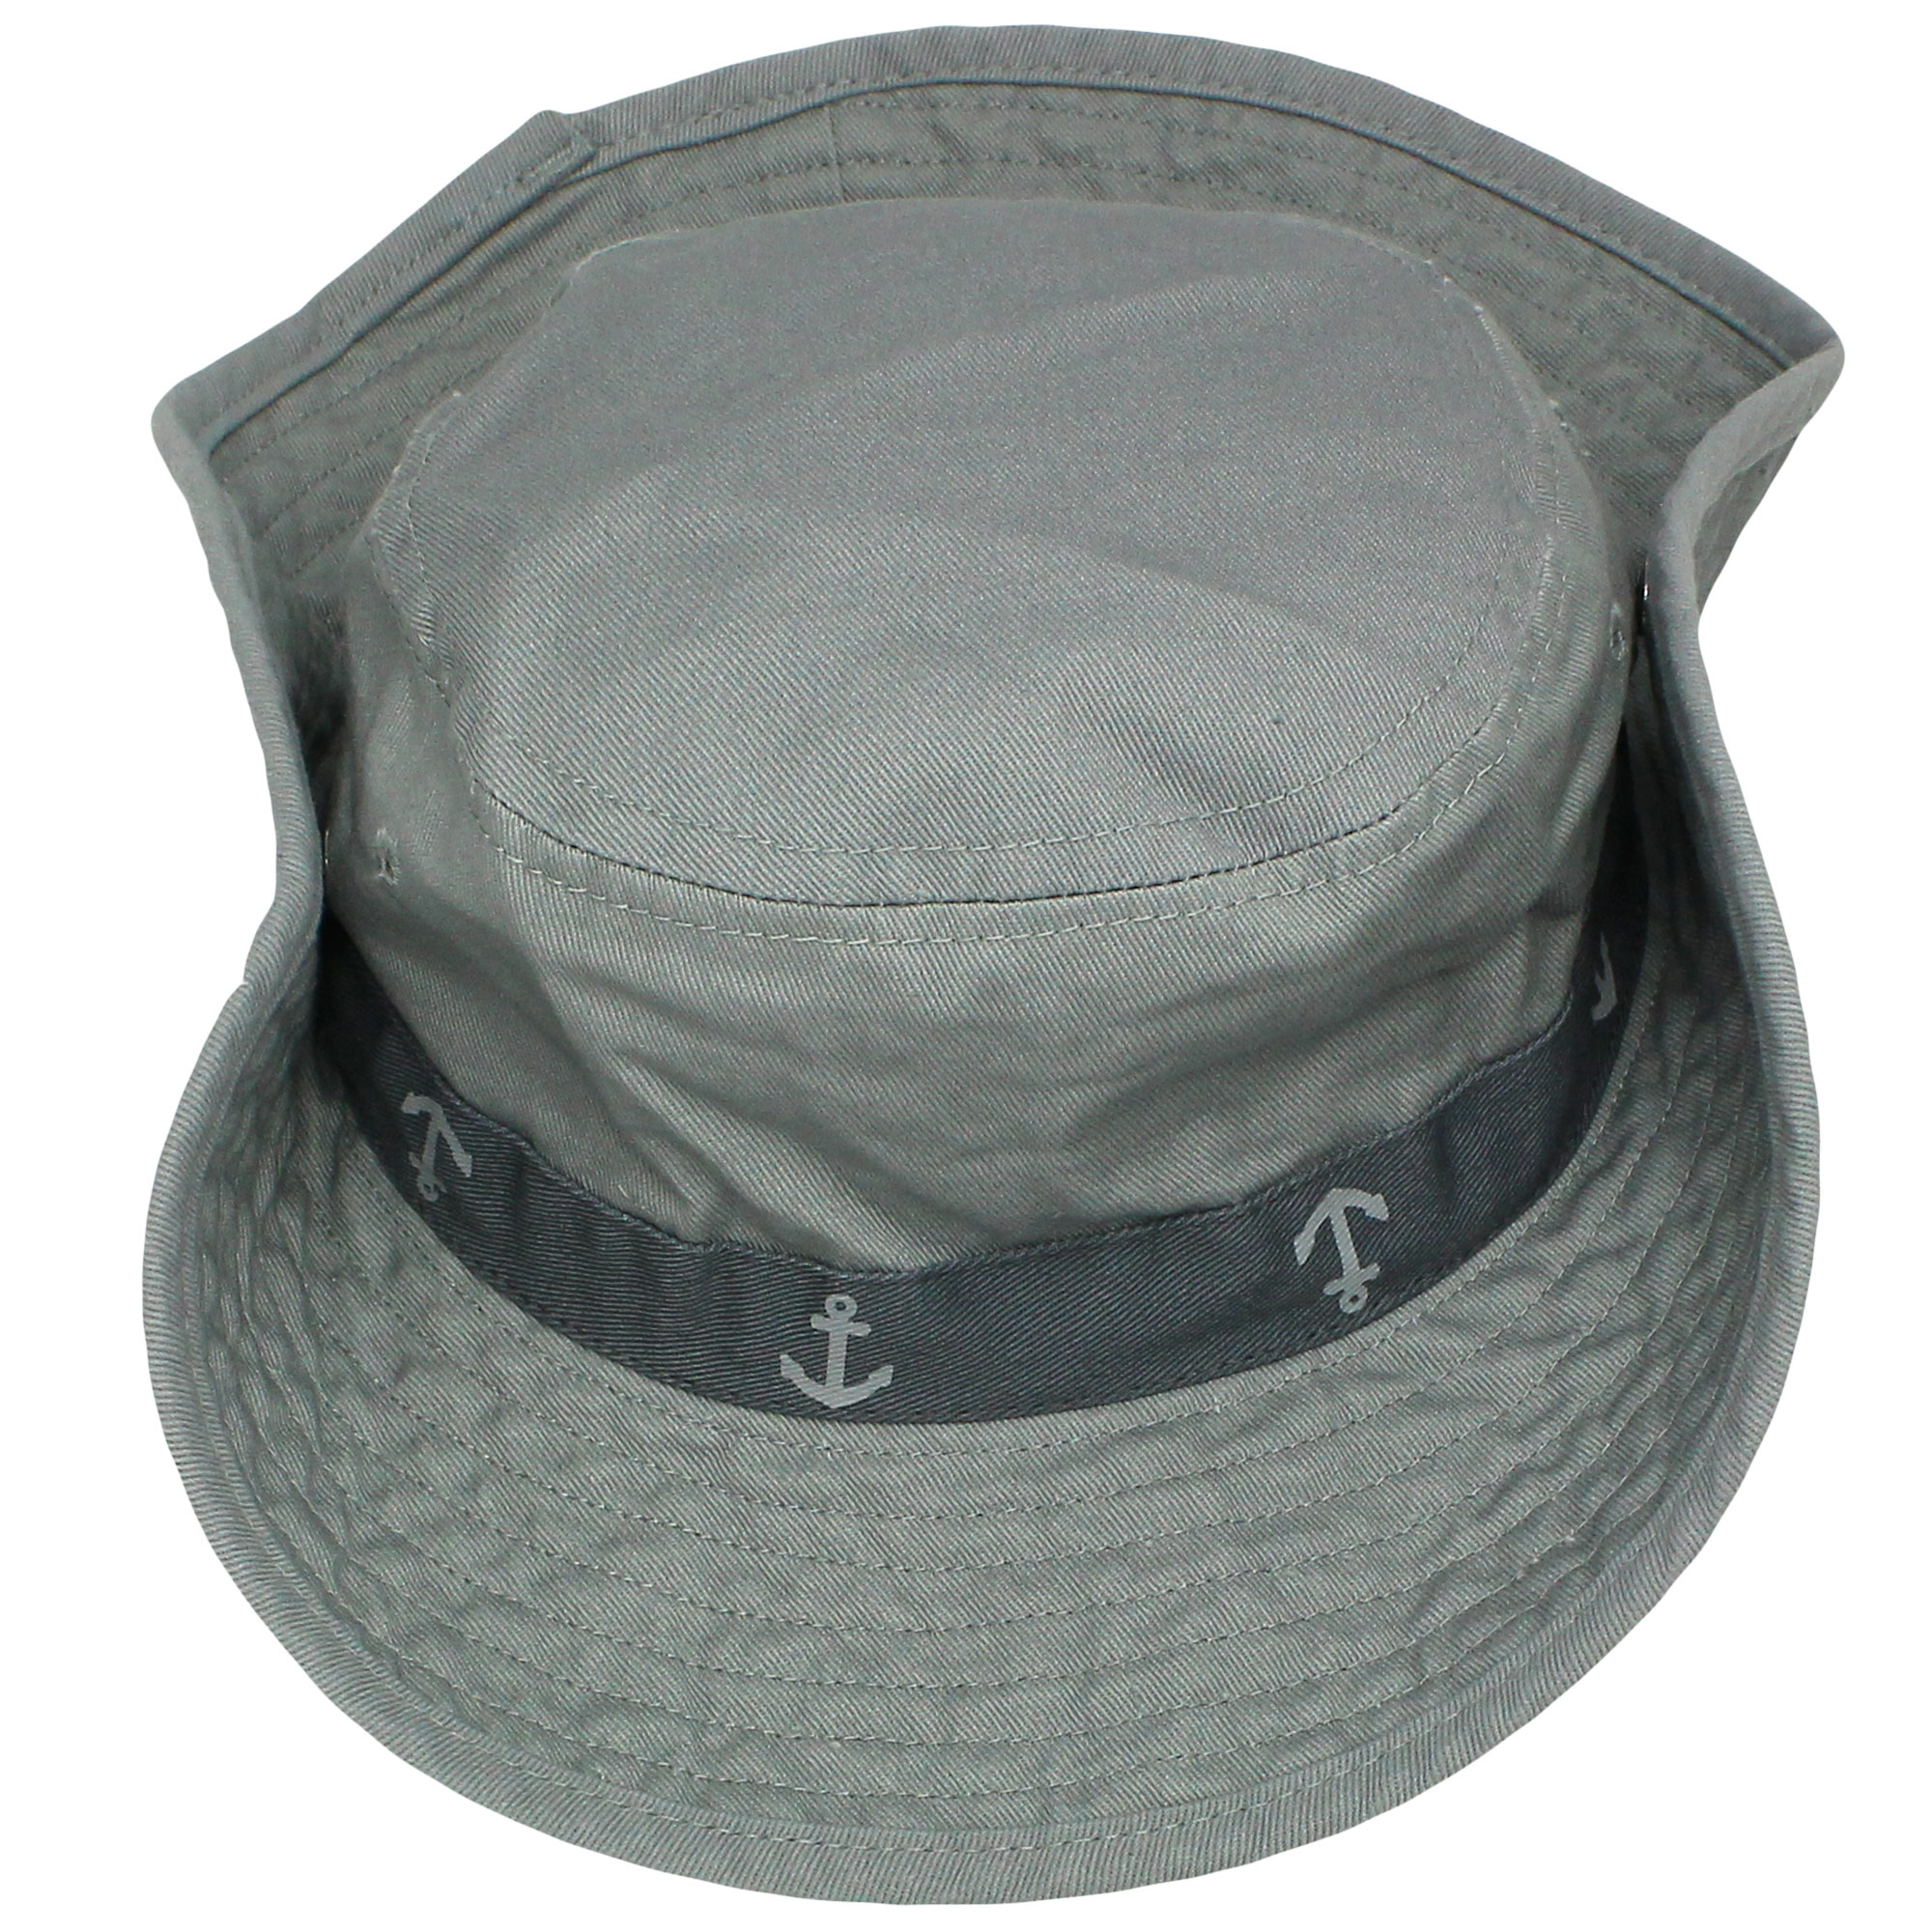 66a6a43642f Carter s Safari Outdoor Bucket Infant Boys Sun Hat Grey 100% Cotton 12-24M  - Walmart.com